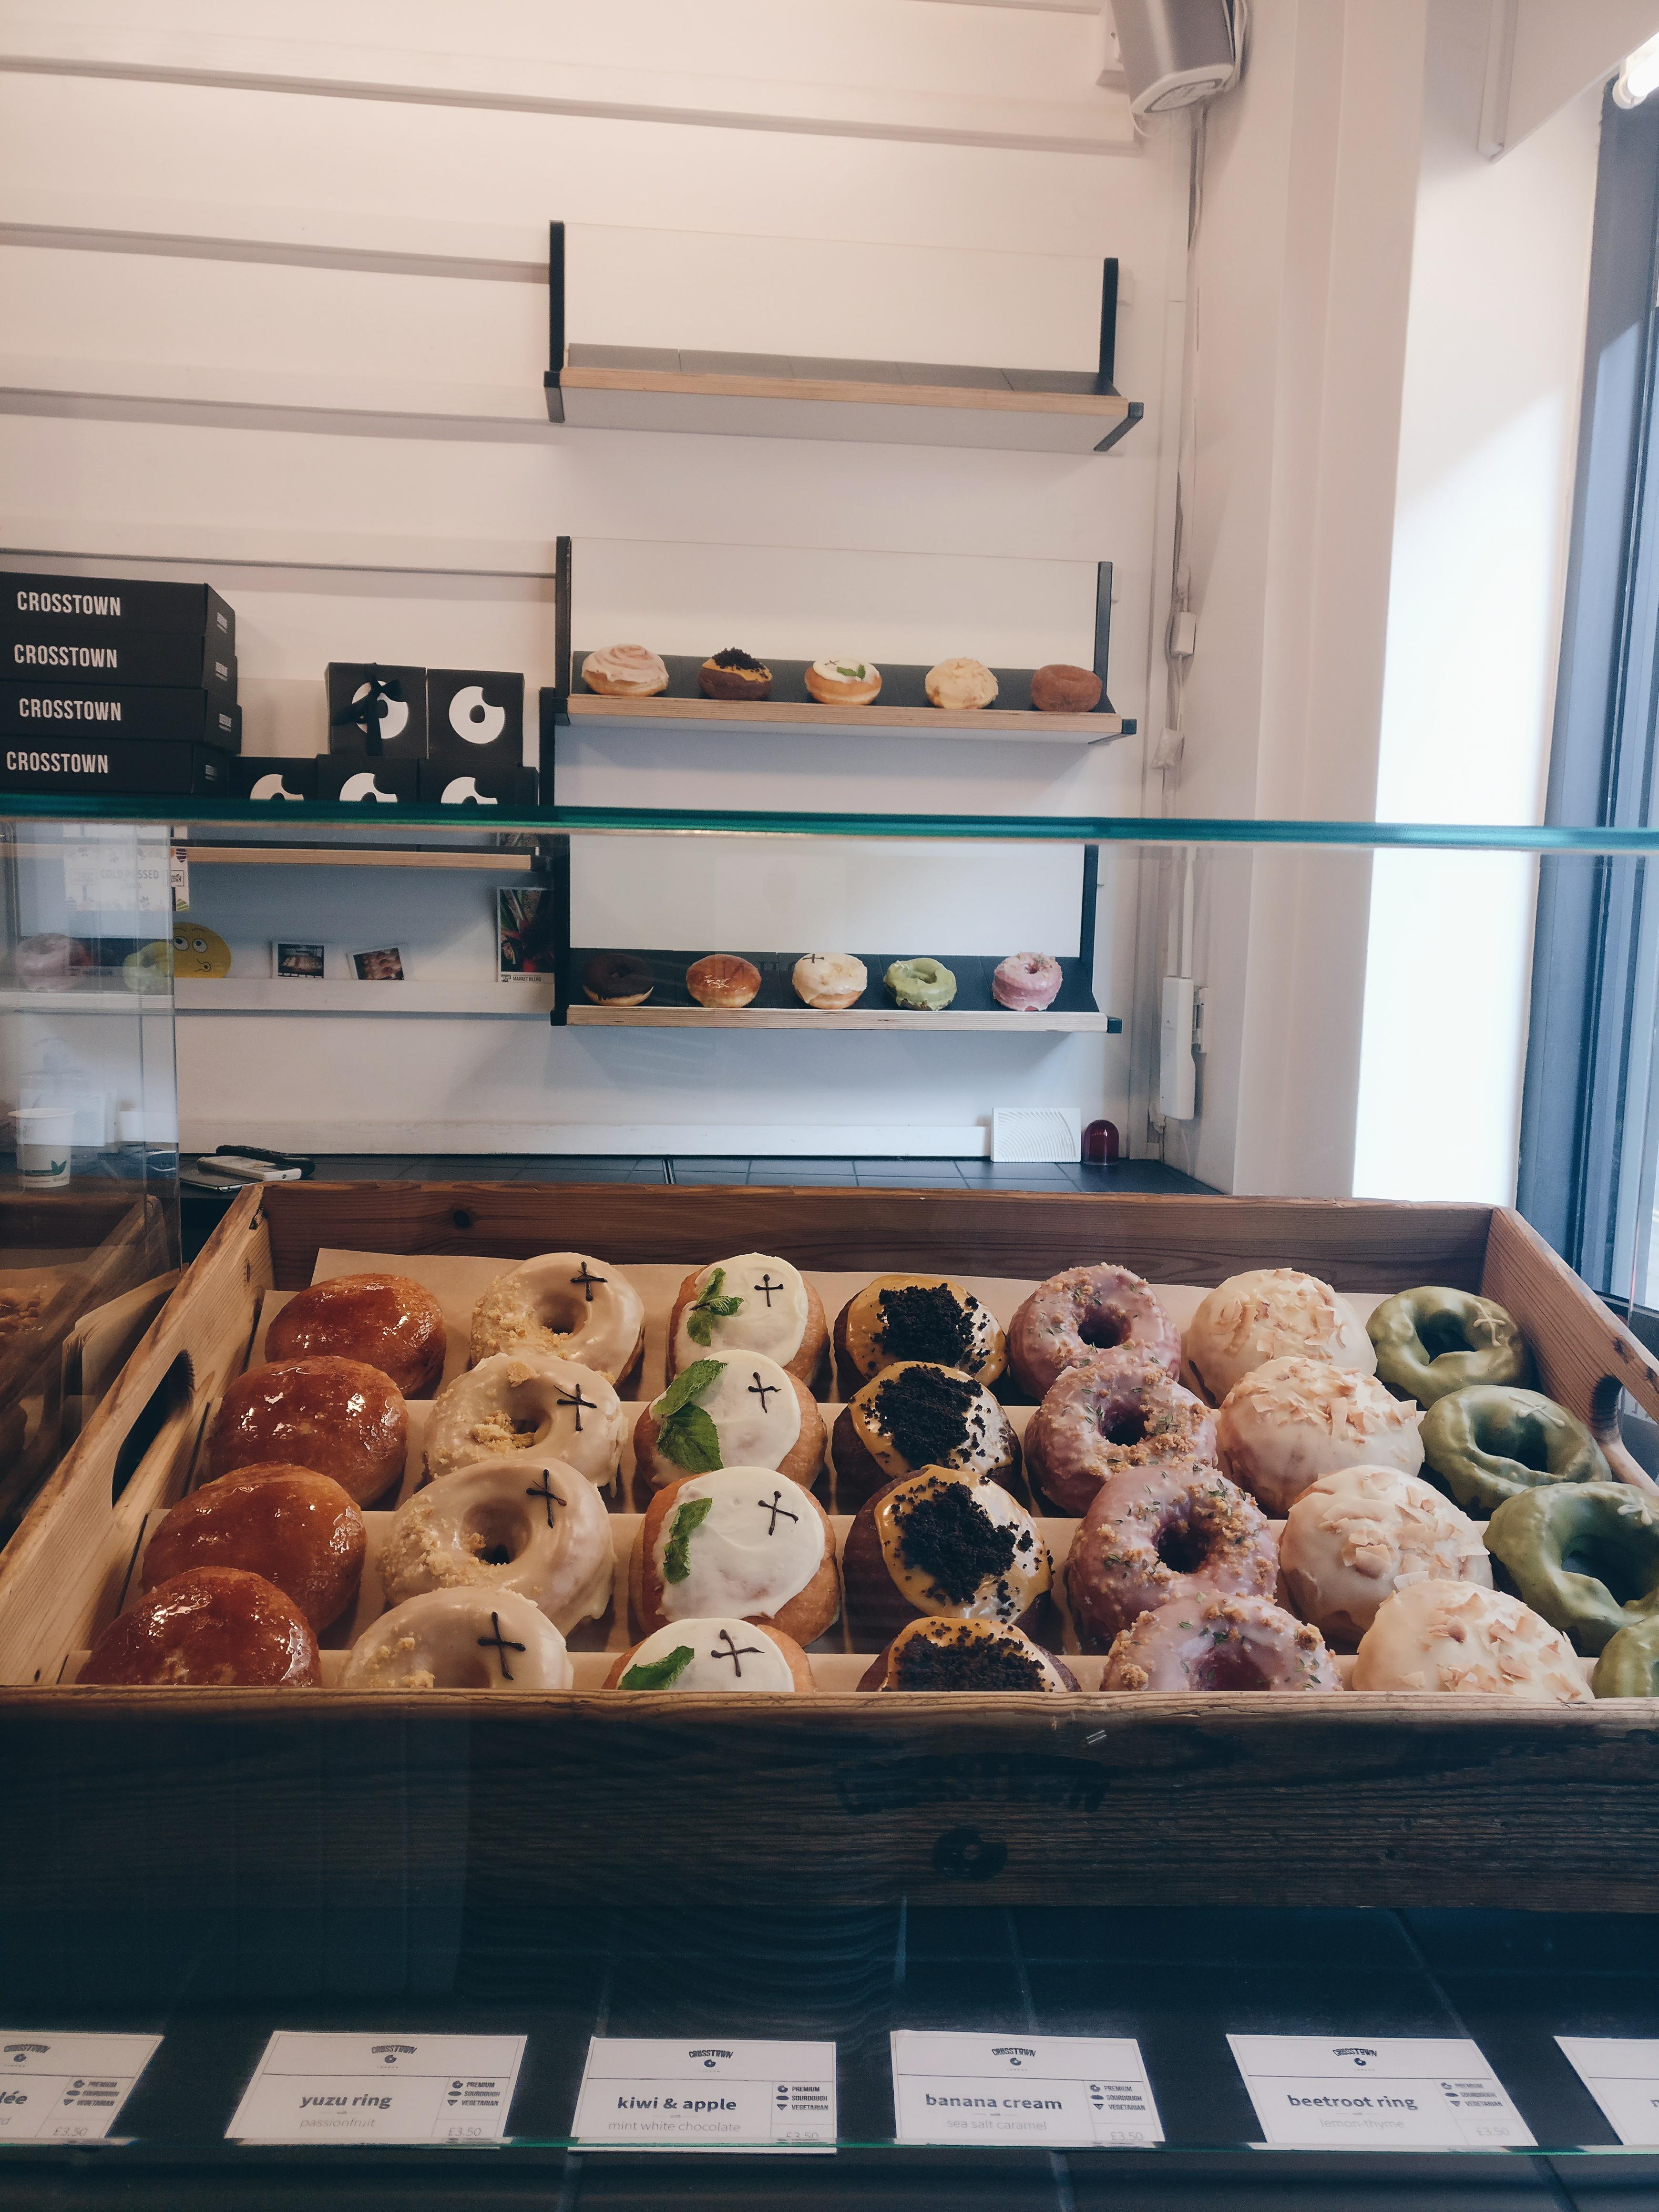 Crosstown Donuts